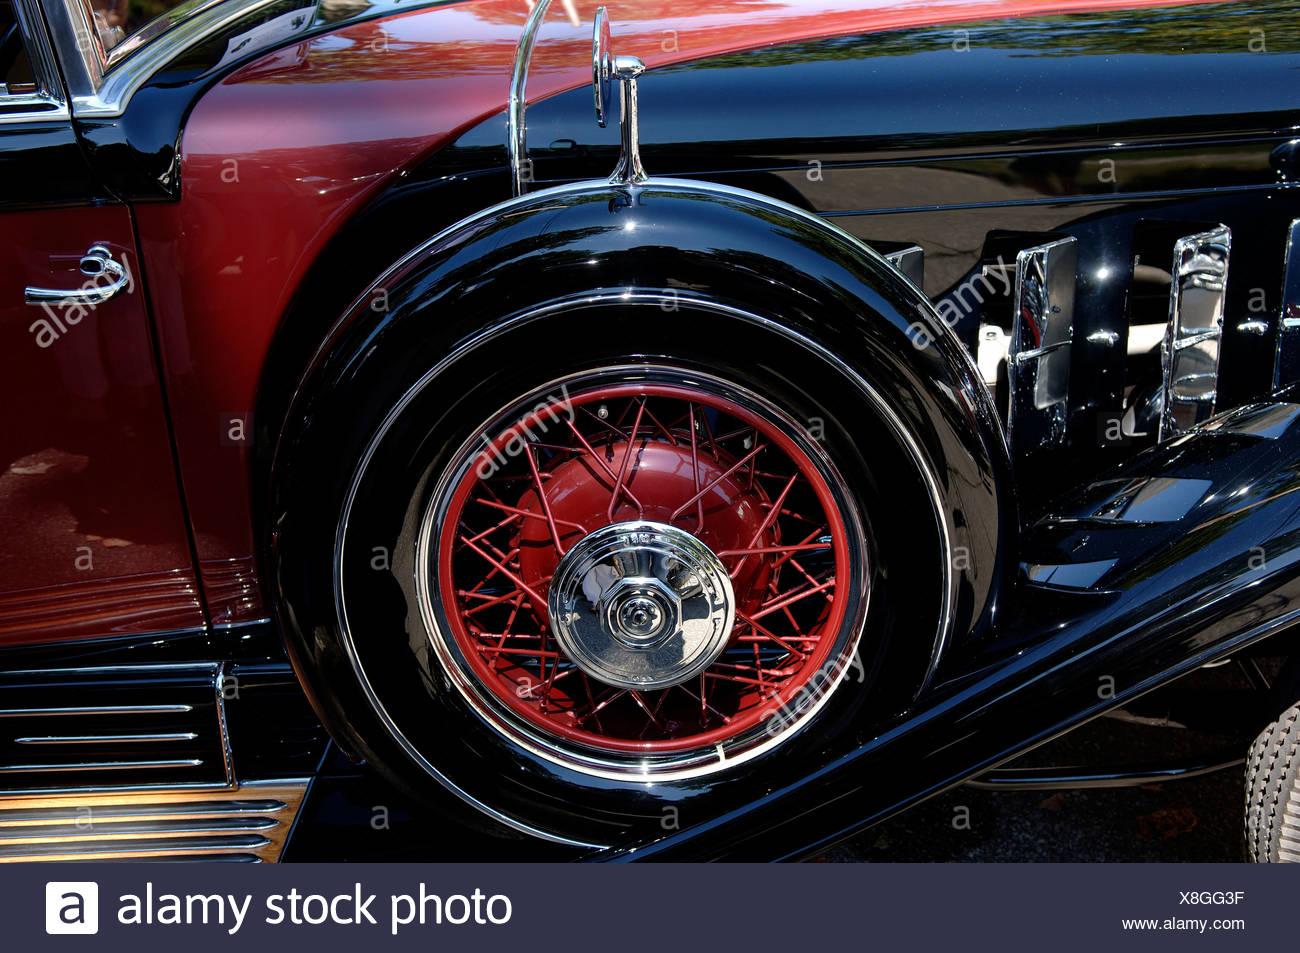 Classic Car Close Up Wheel Stockfotos & Classic Car Close Up Wheel ...